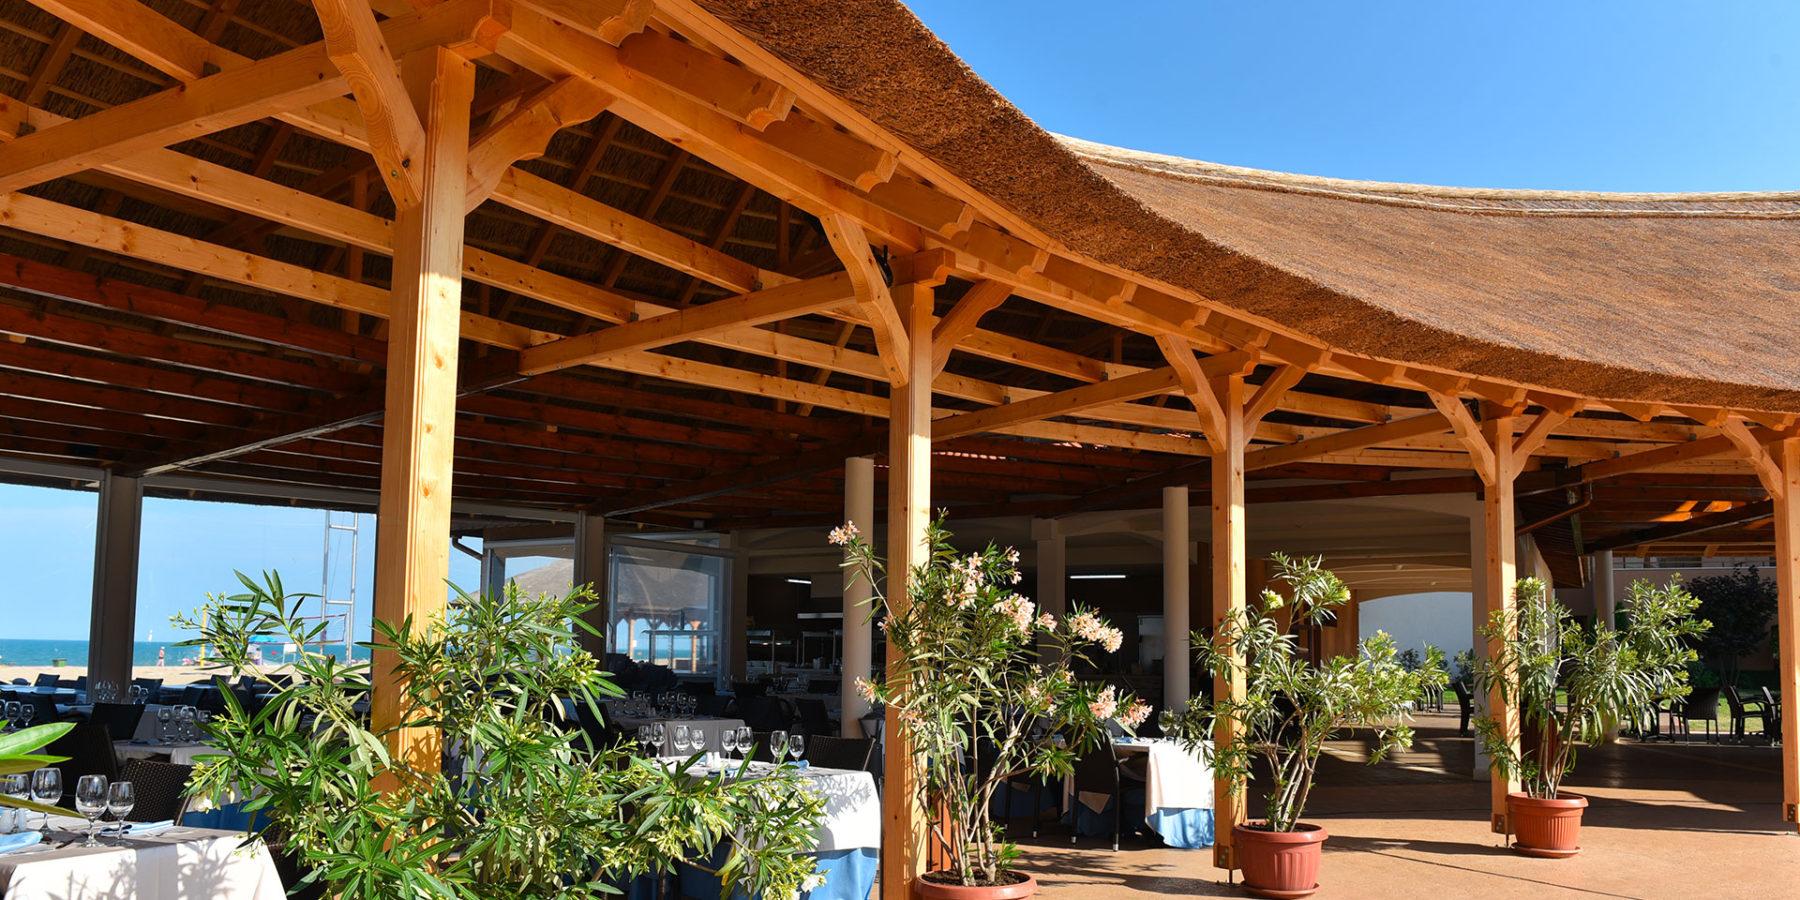 Bars HVD Clubhotel Miramar